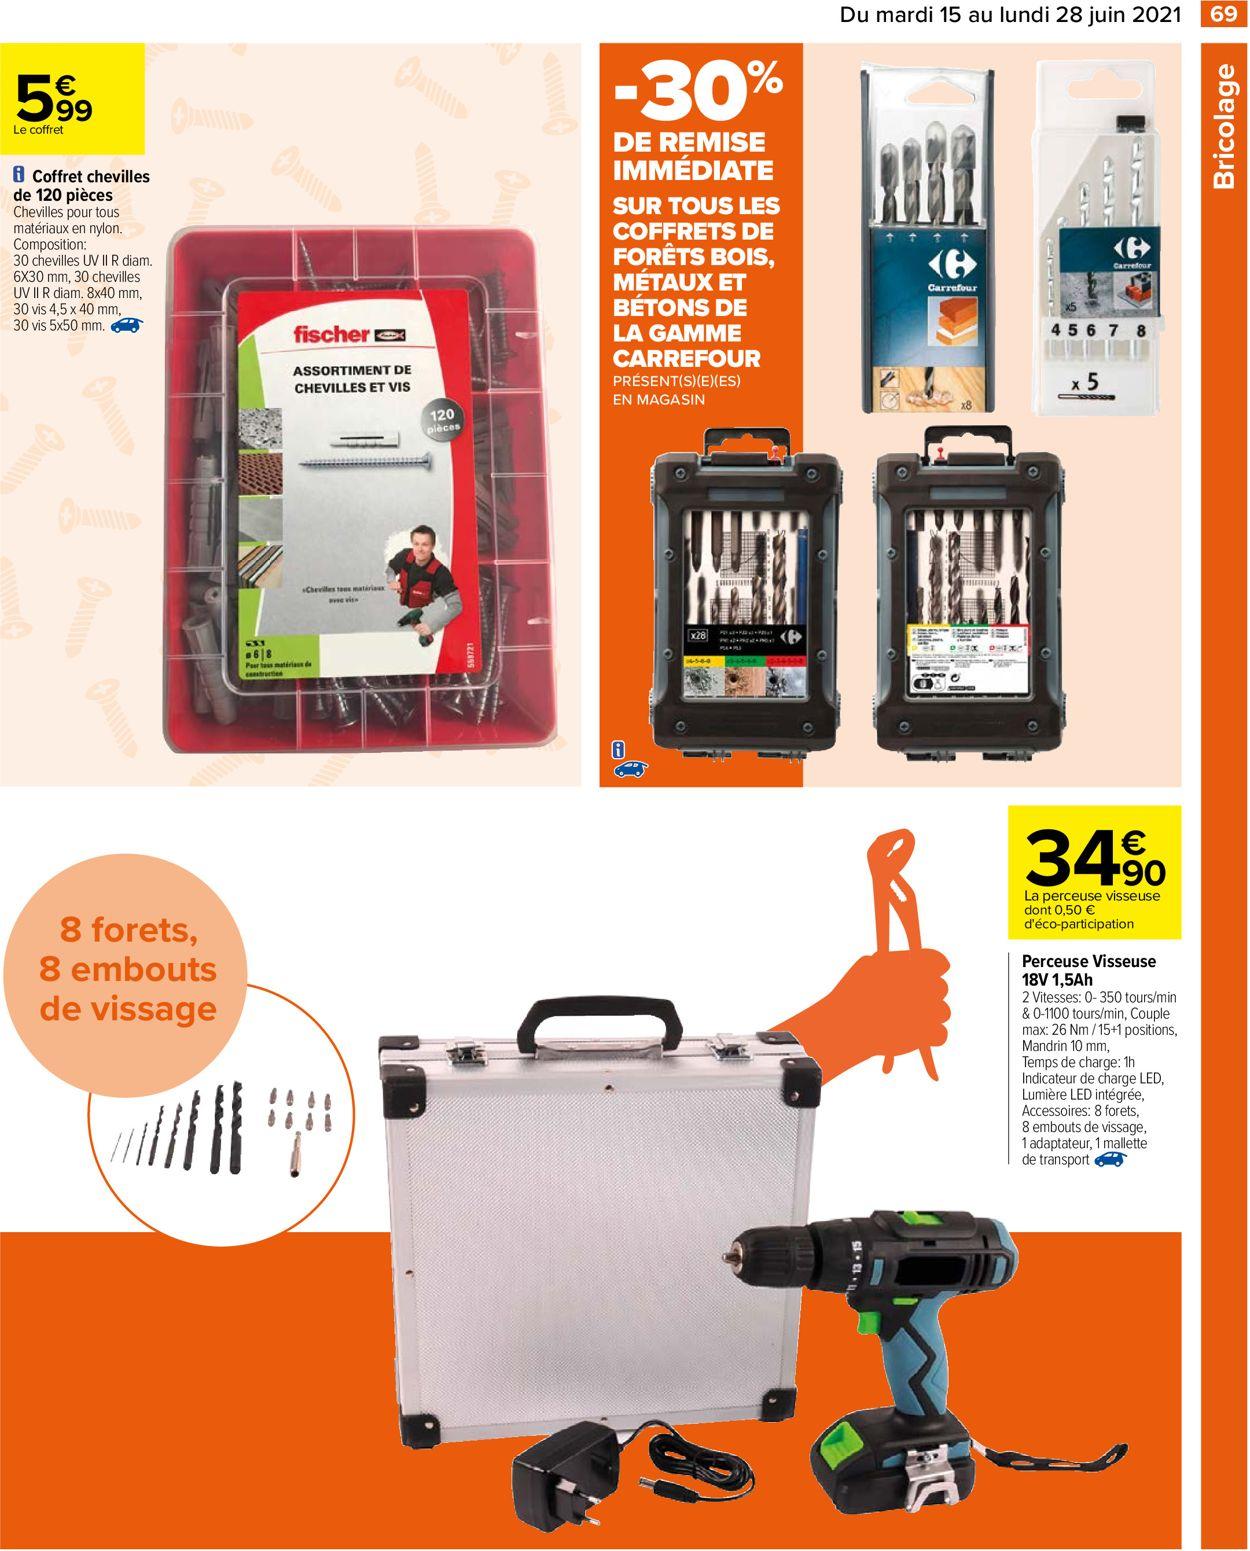 Carrefour Catalogue - 15.06-28.06.2021 (Page 74)